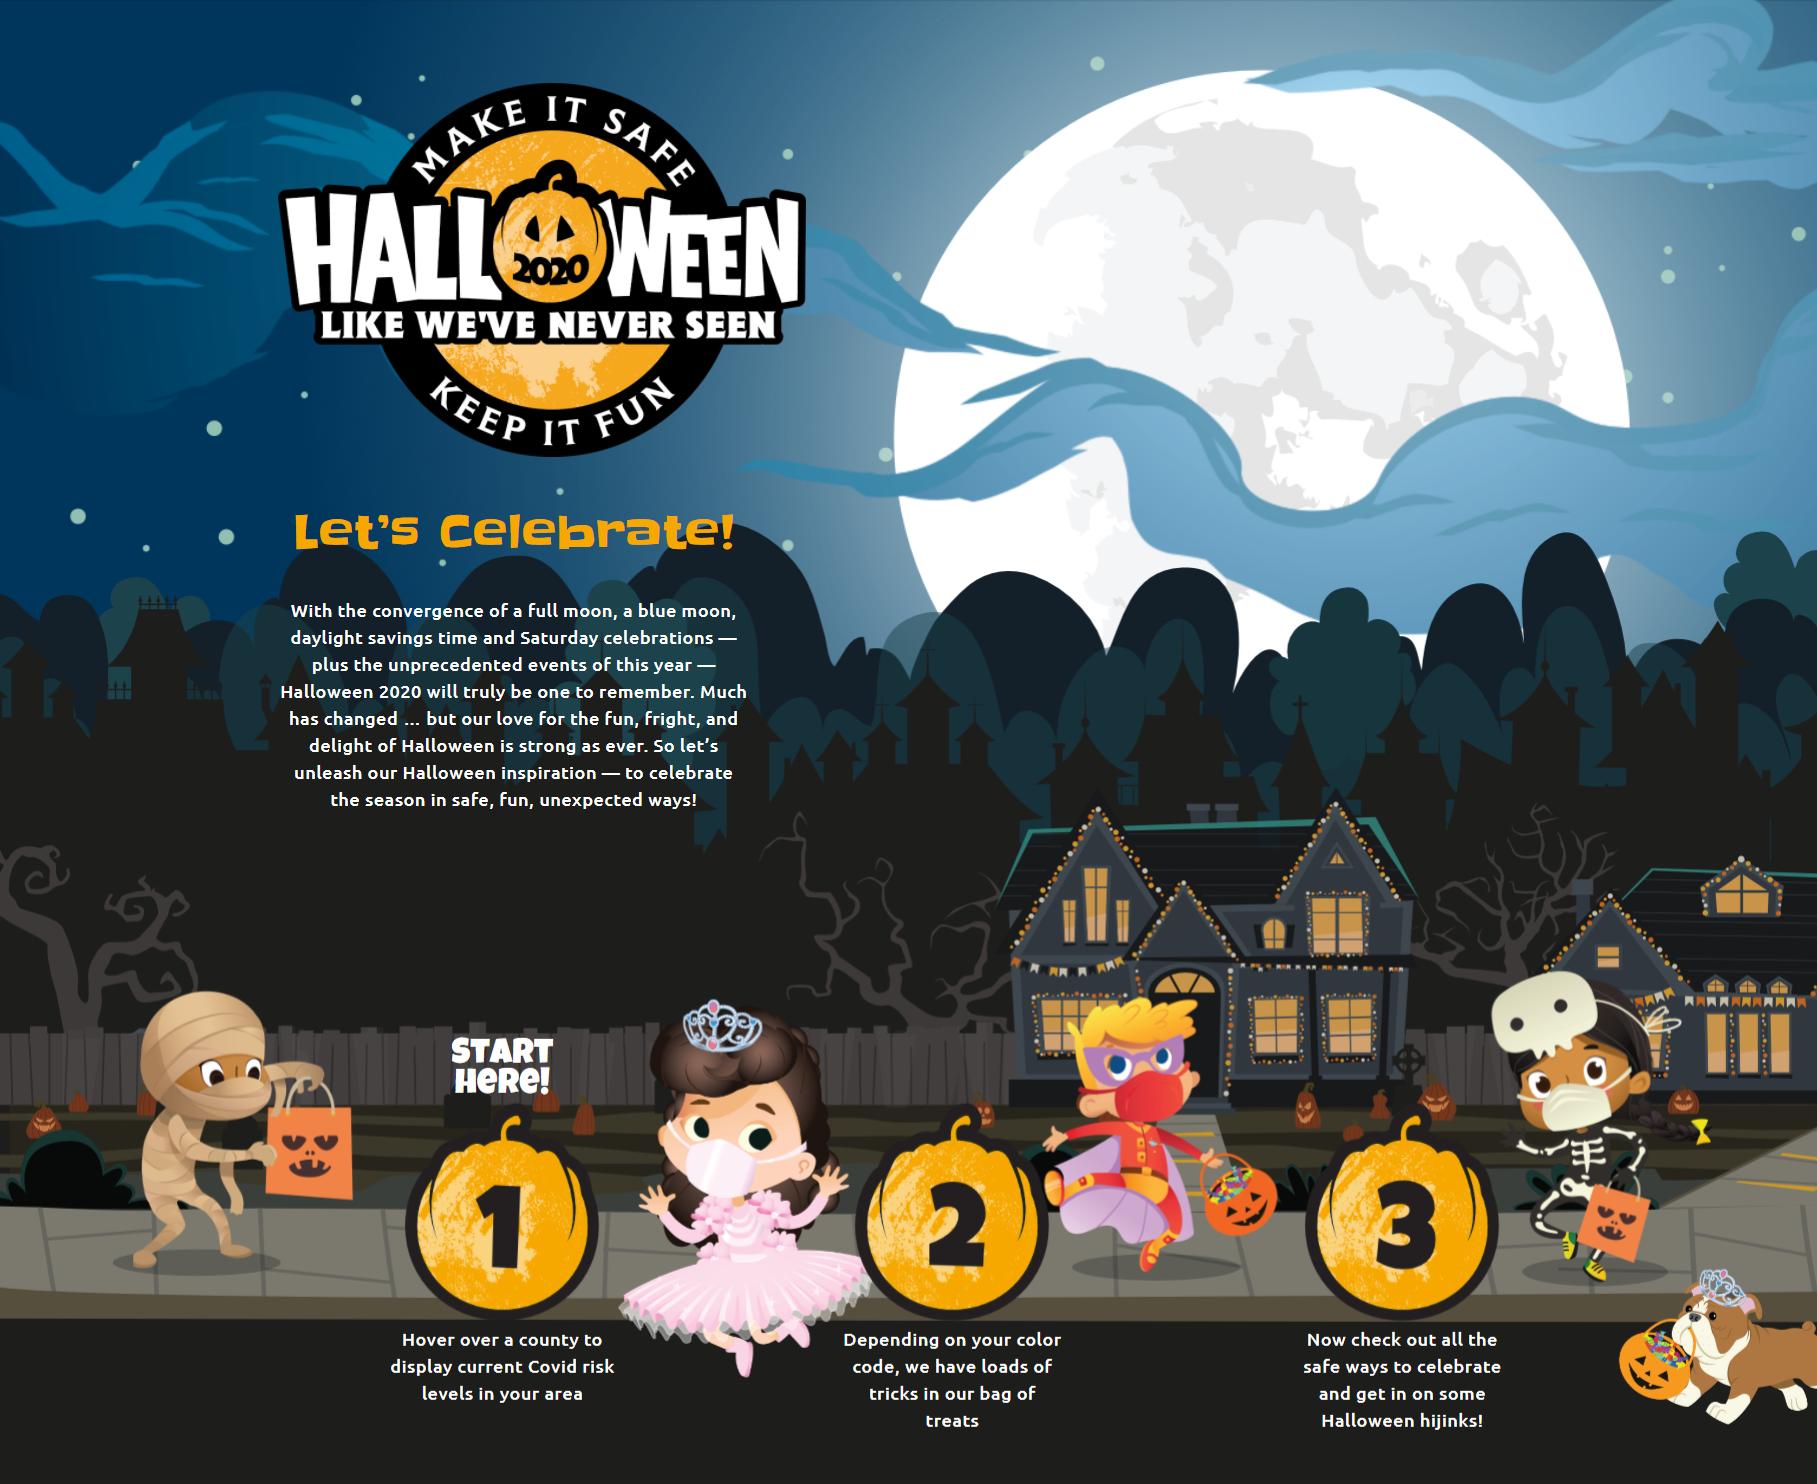 screencapture-halloween2020-org-2020-09-14-10_36_04.png